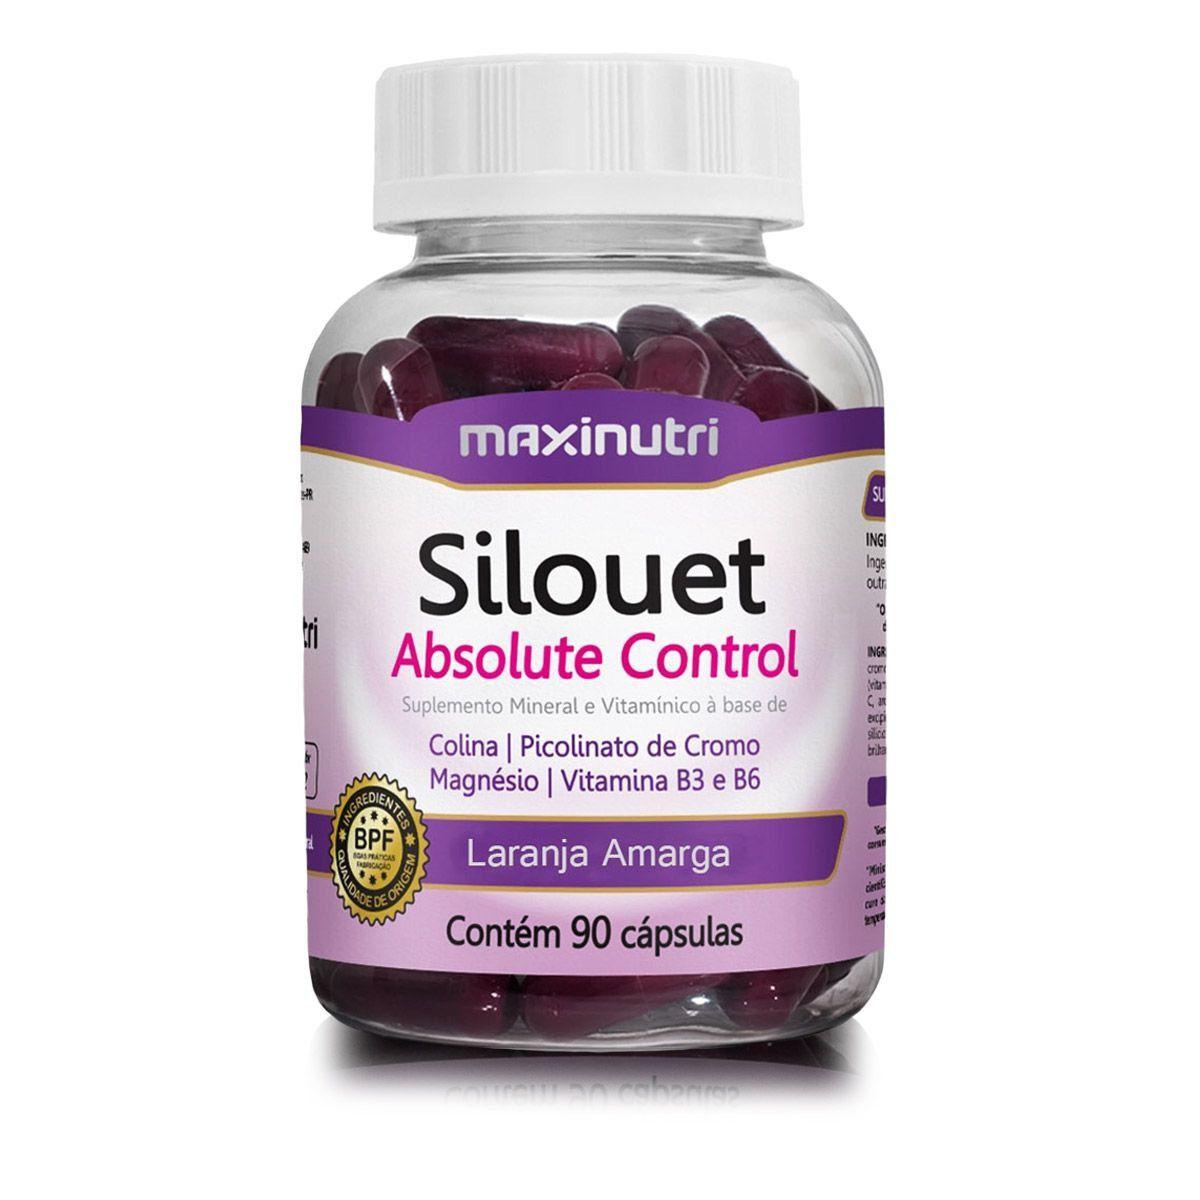 Silouet Absolut Control 90 Cápsulas - Maxinutri